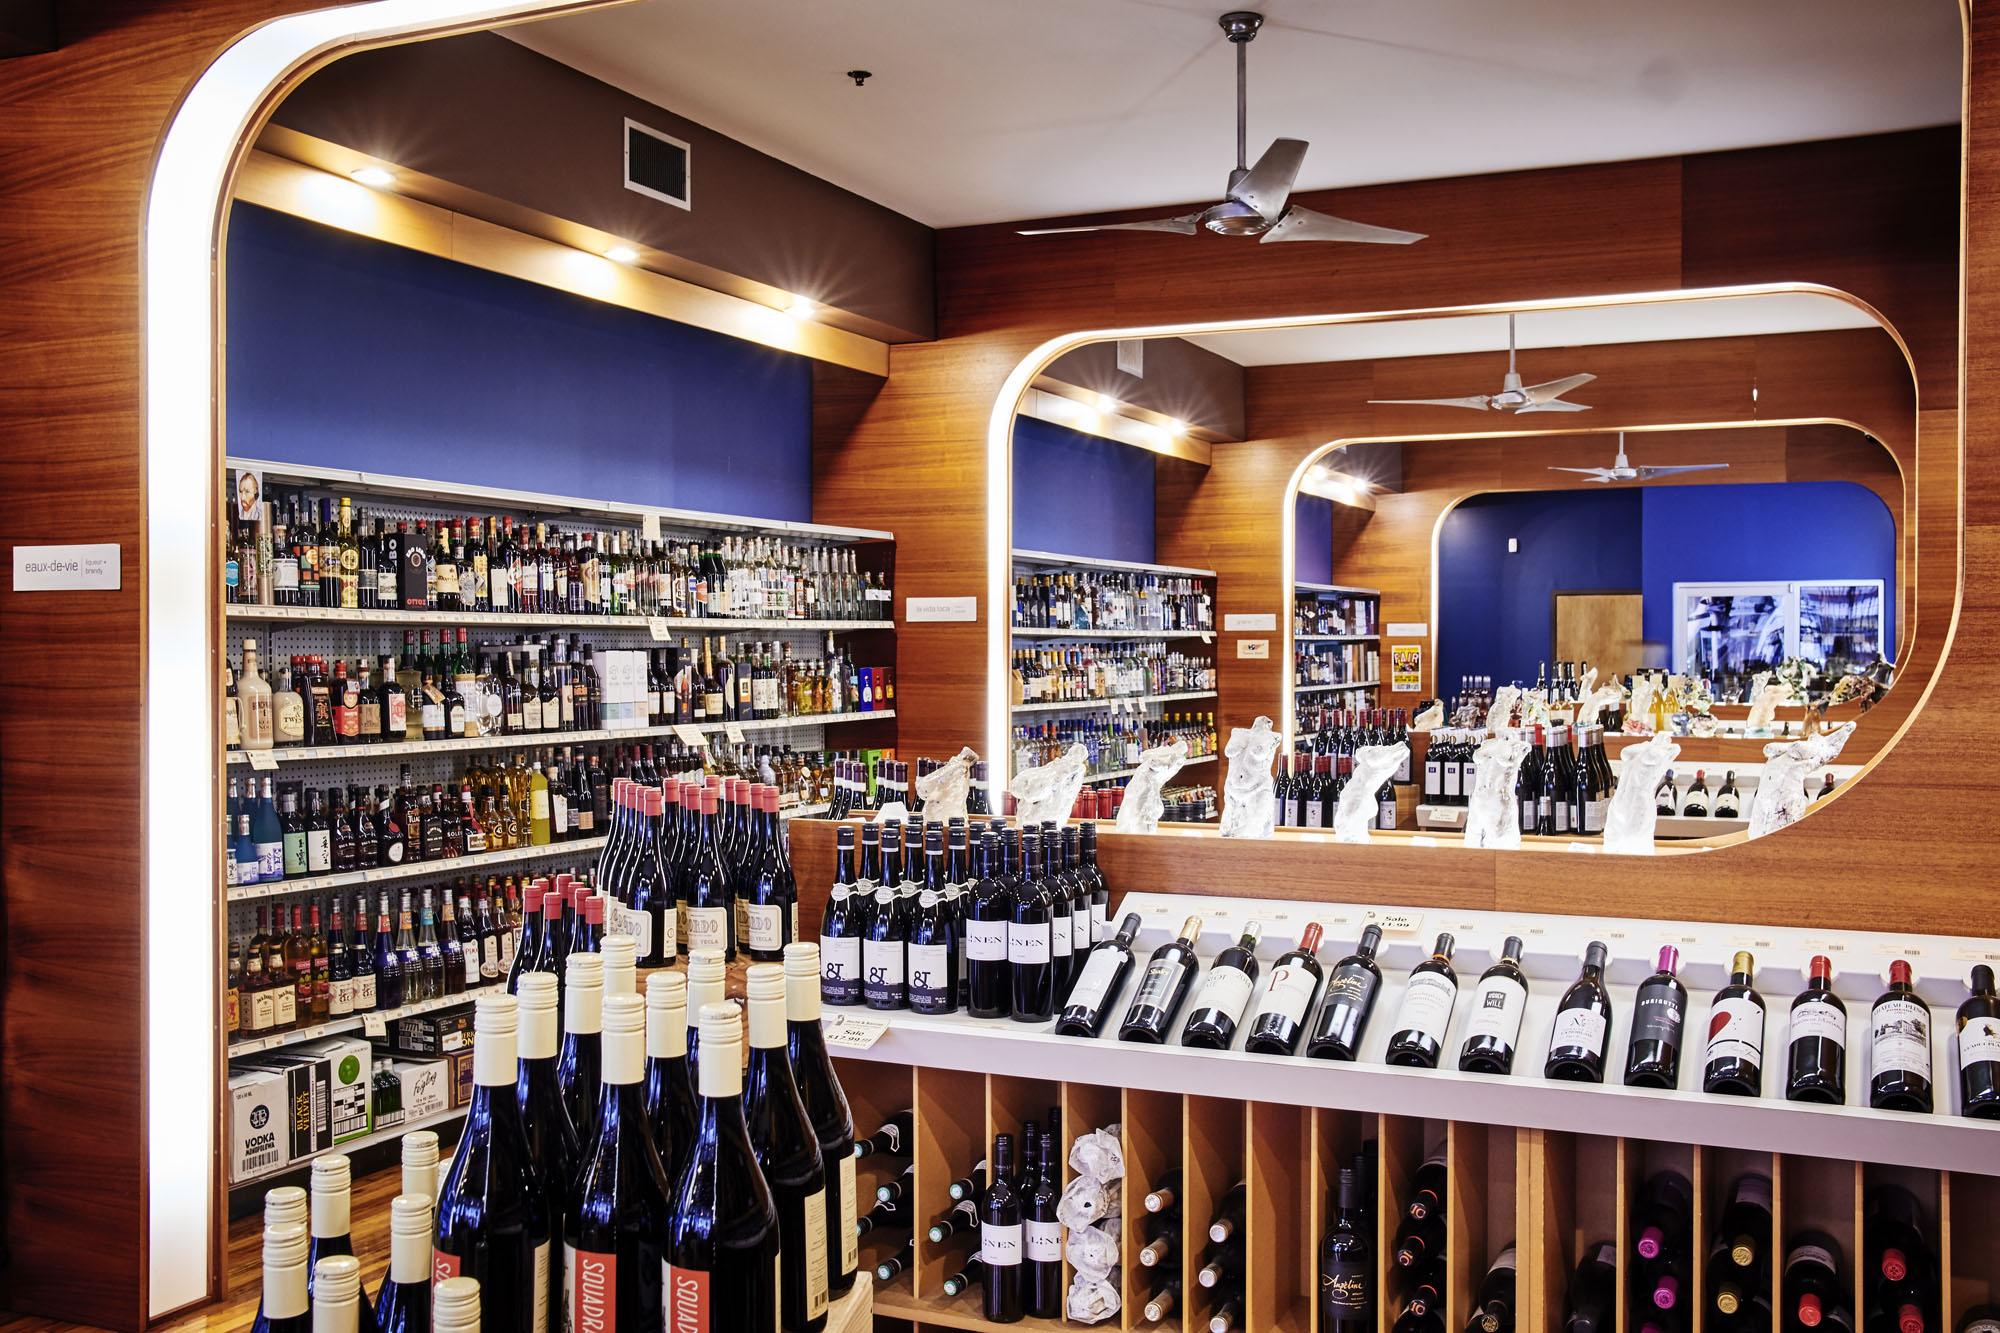 Downtown_Wine_Spirits-041 (1).jpg